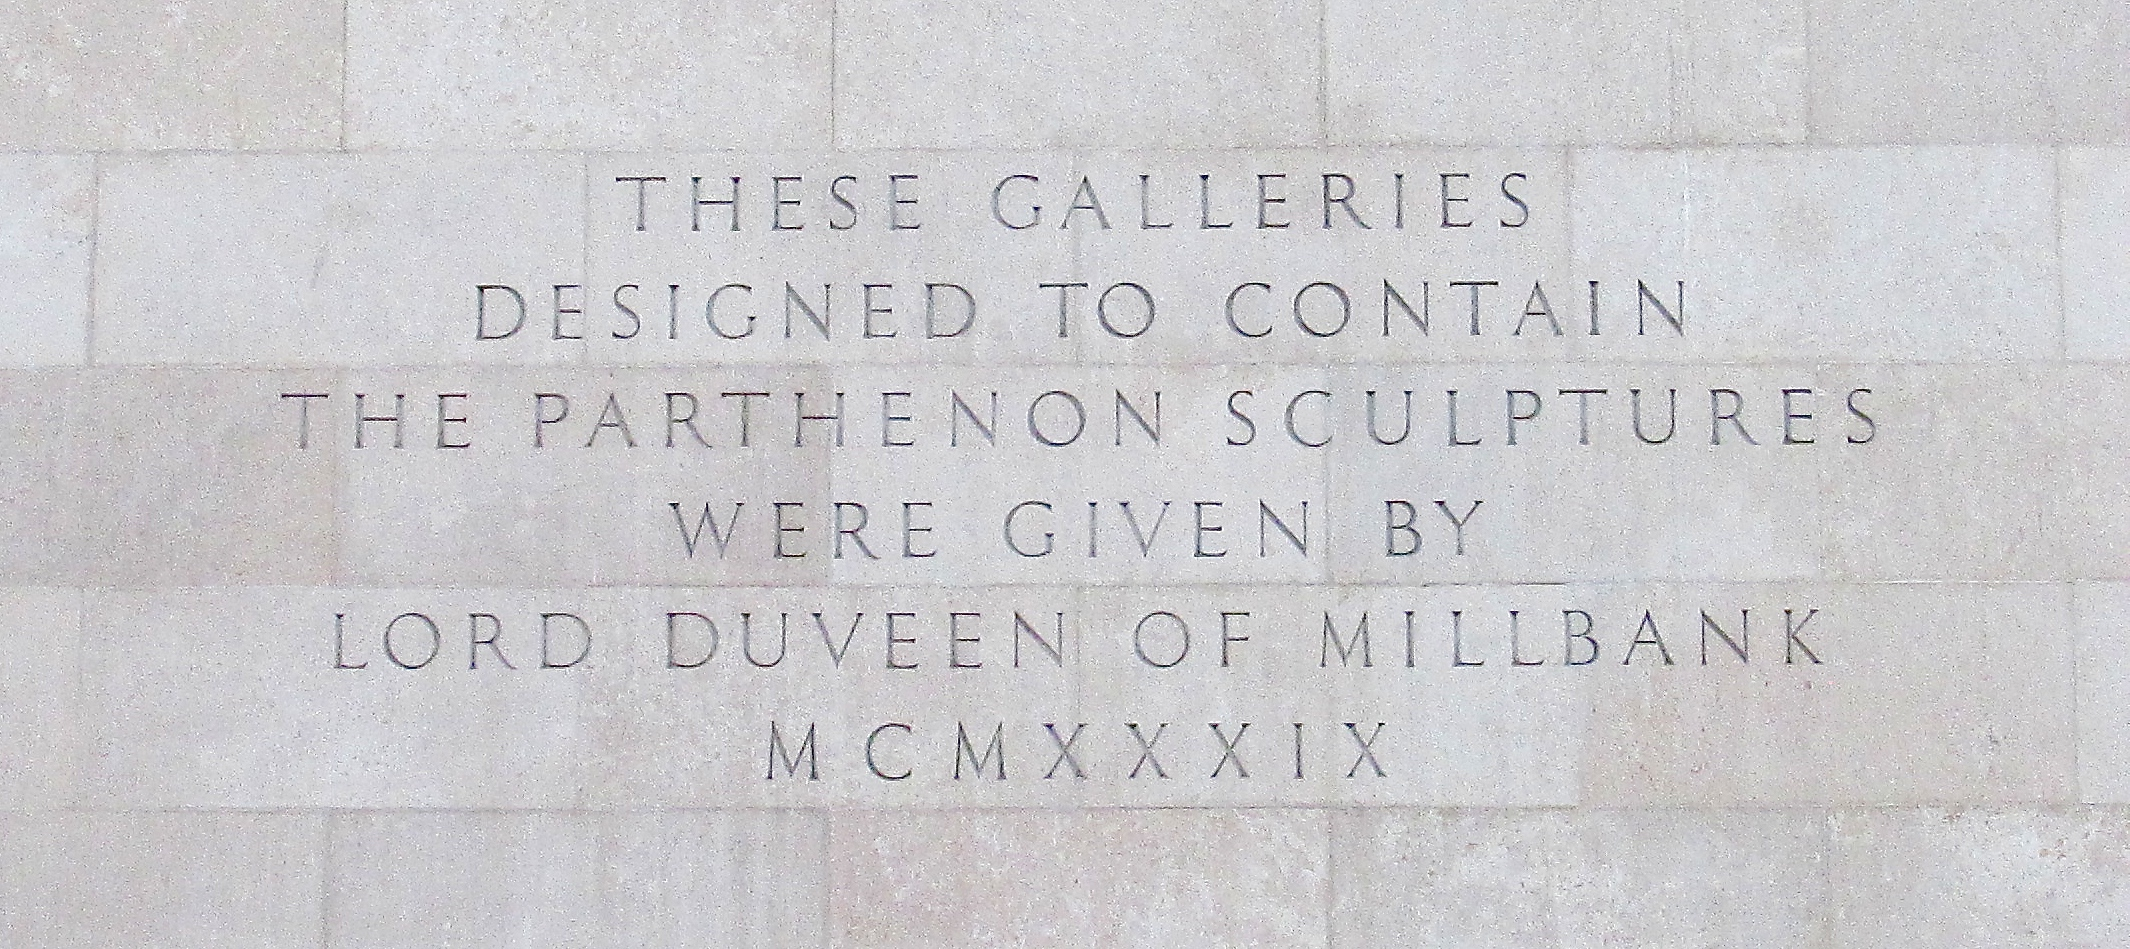 BritishMuseum.jpg